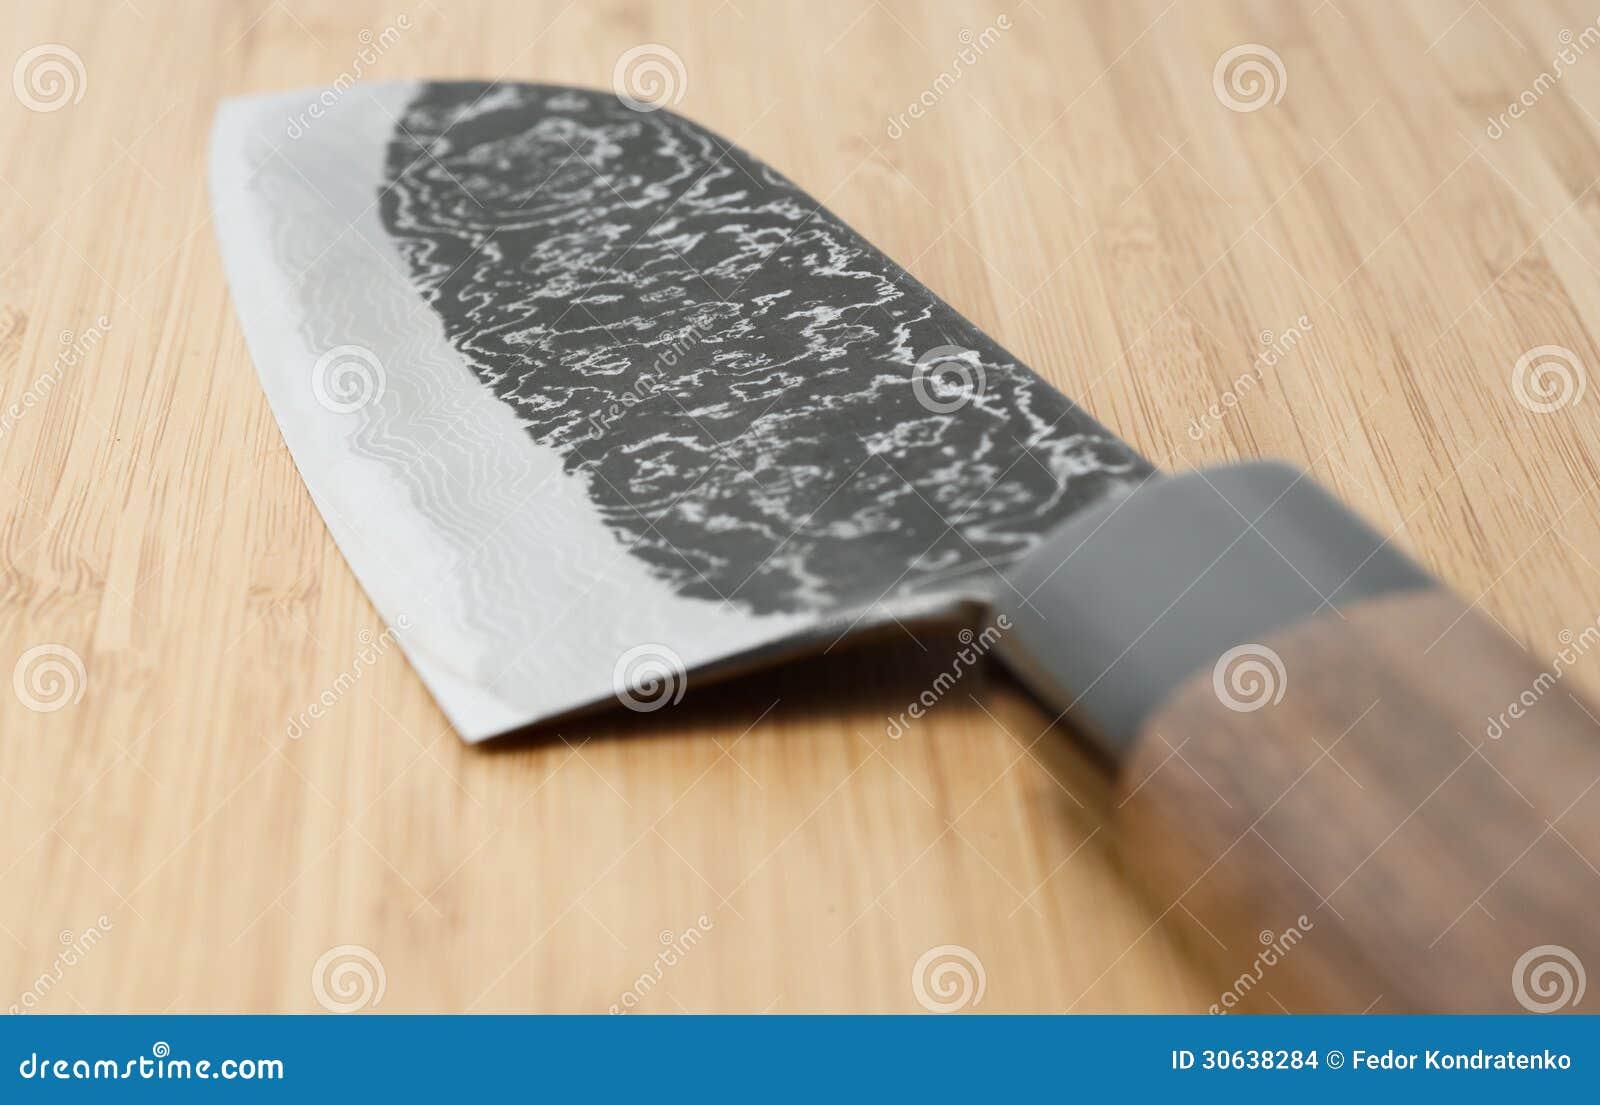 how to close a wichard knife